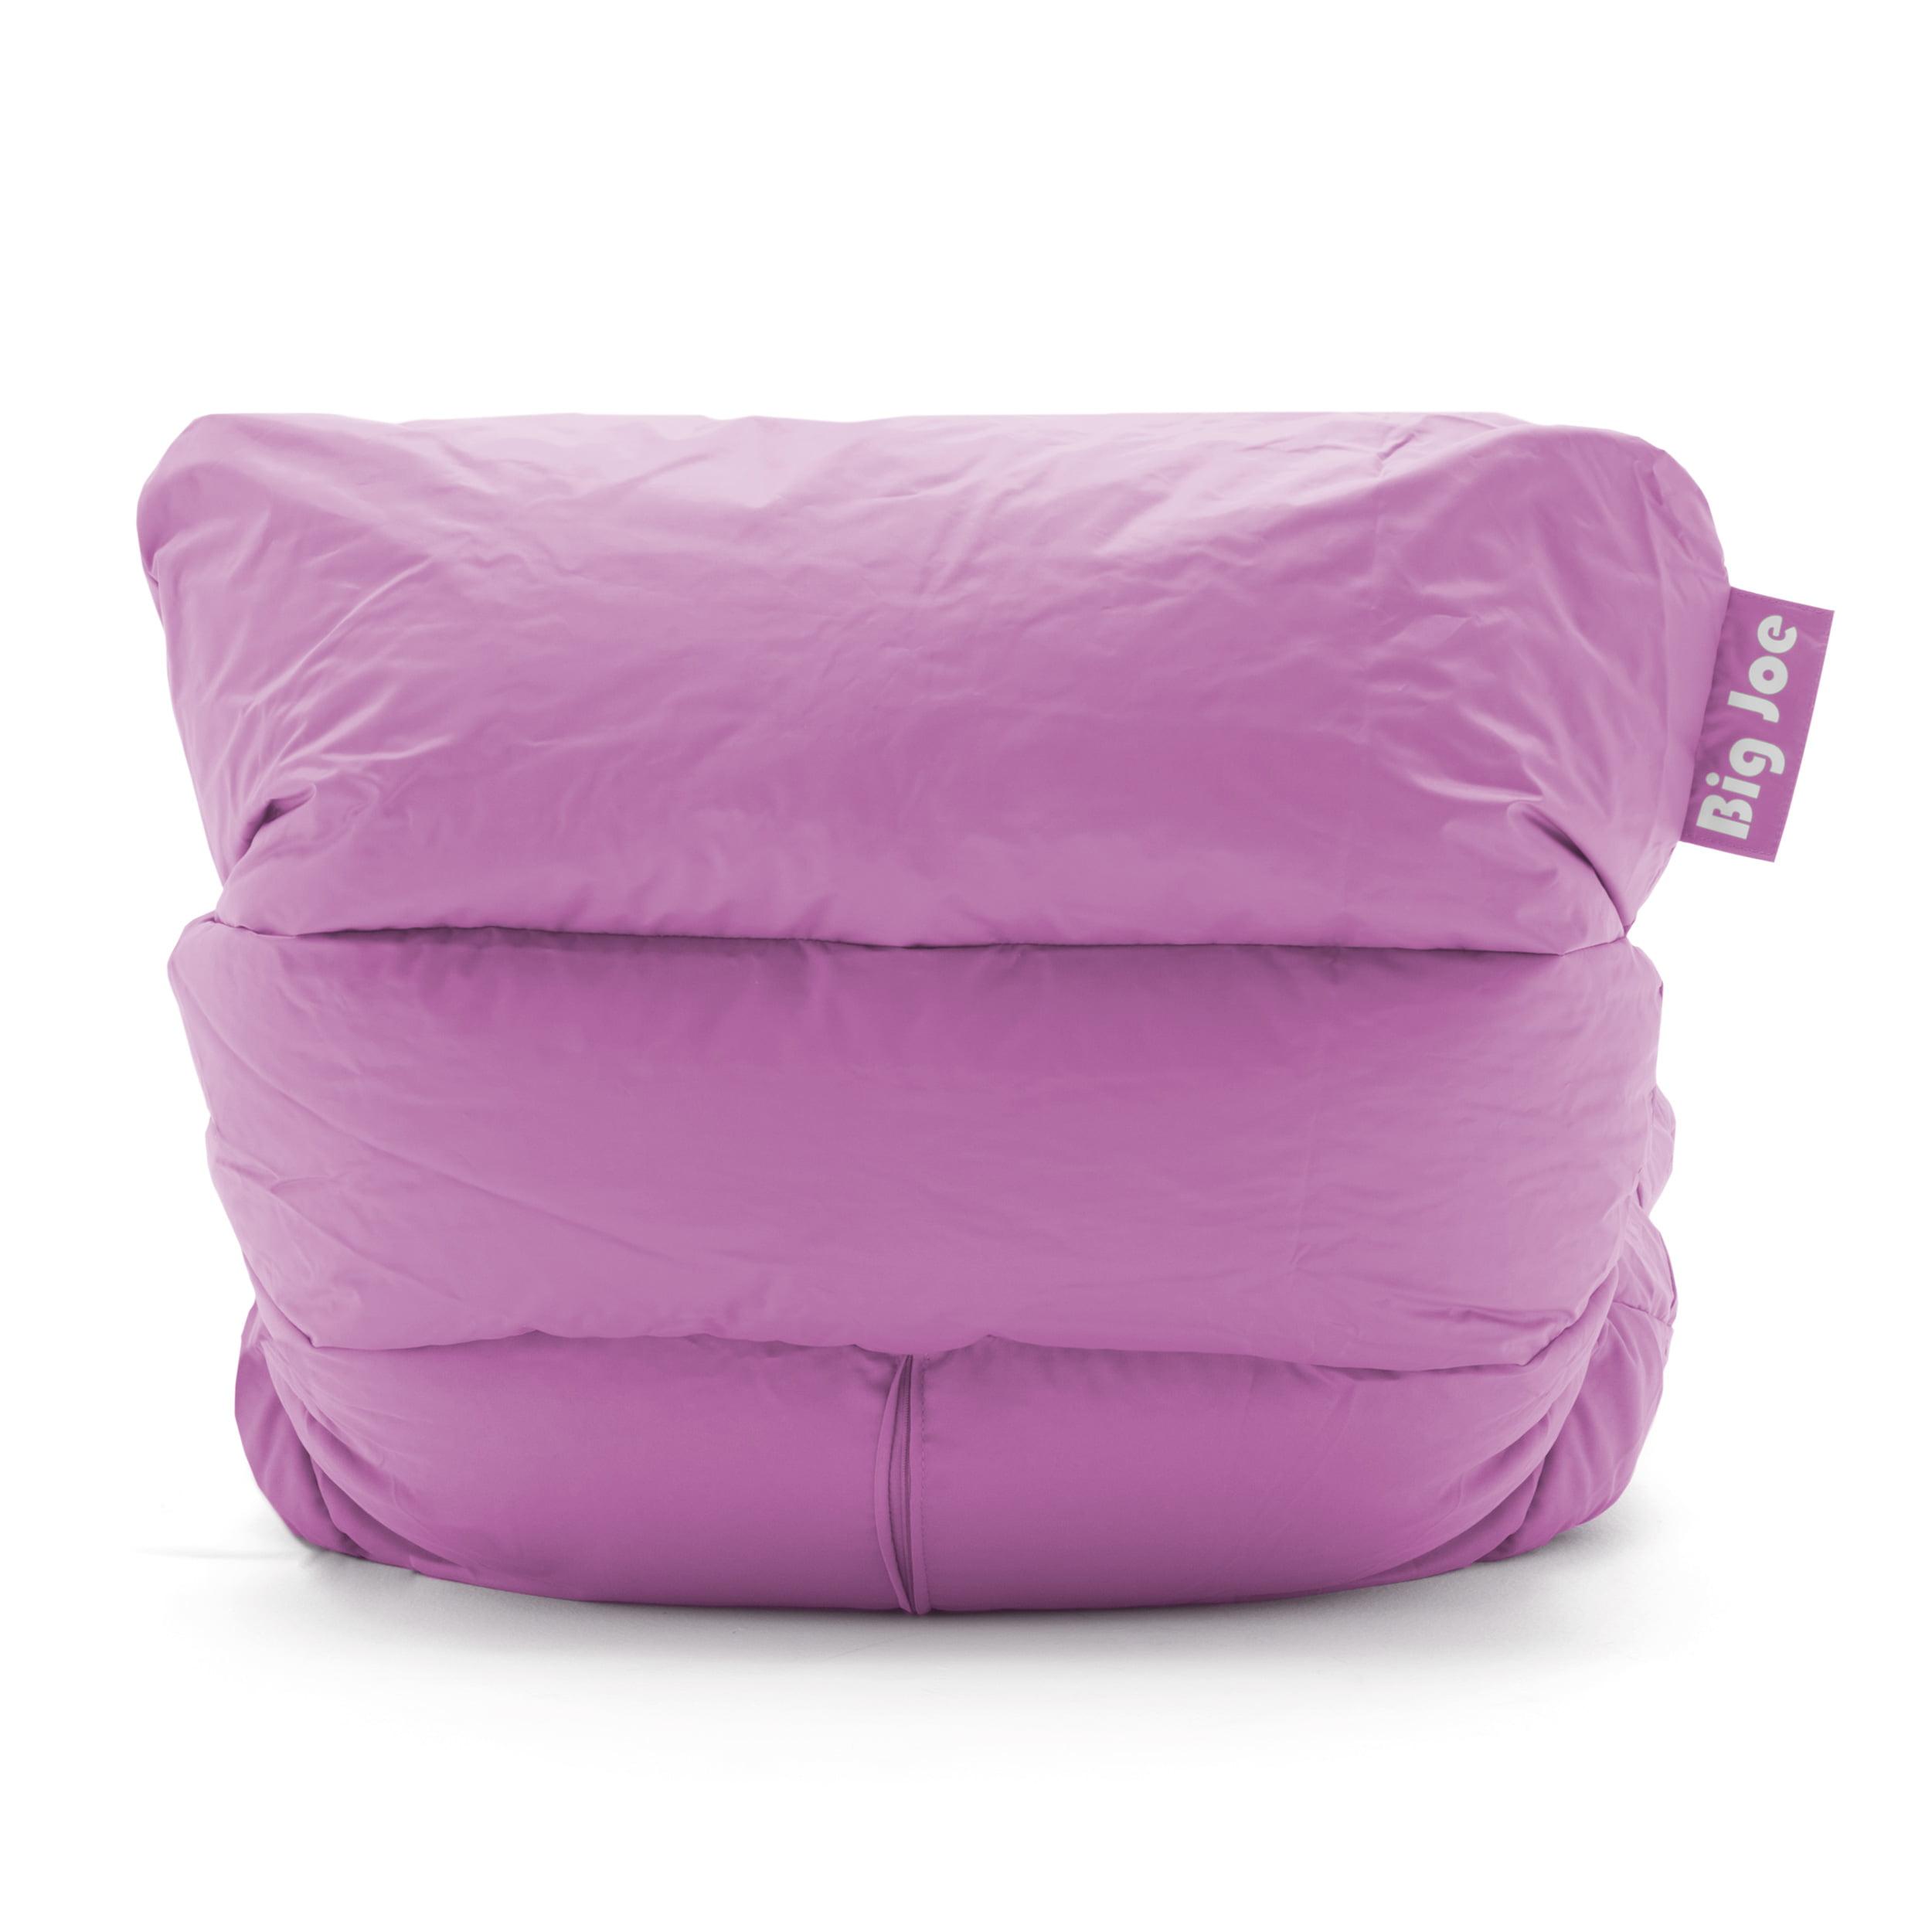 Tremendous Big Joe Roma Floor Bean Bag Chair Multiple Colors Fabrics Beatyapartments Chair Design Images Beatyapartmentscom